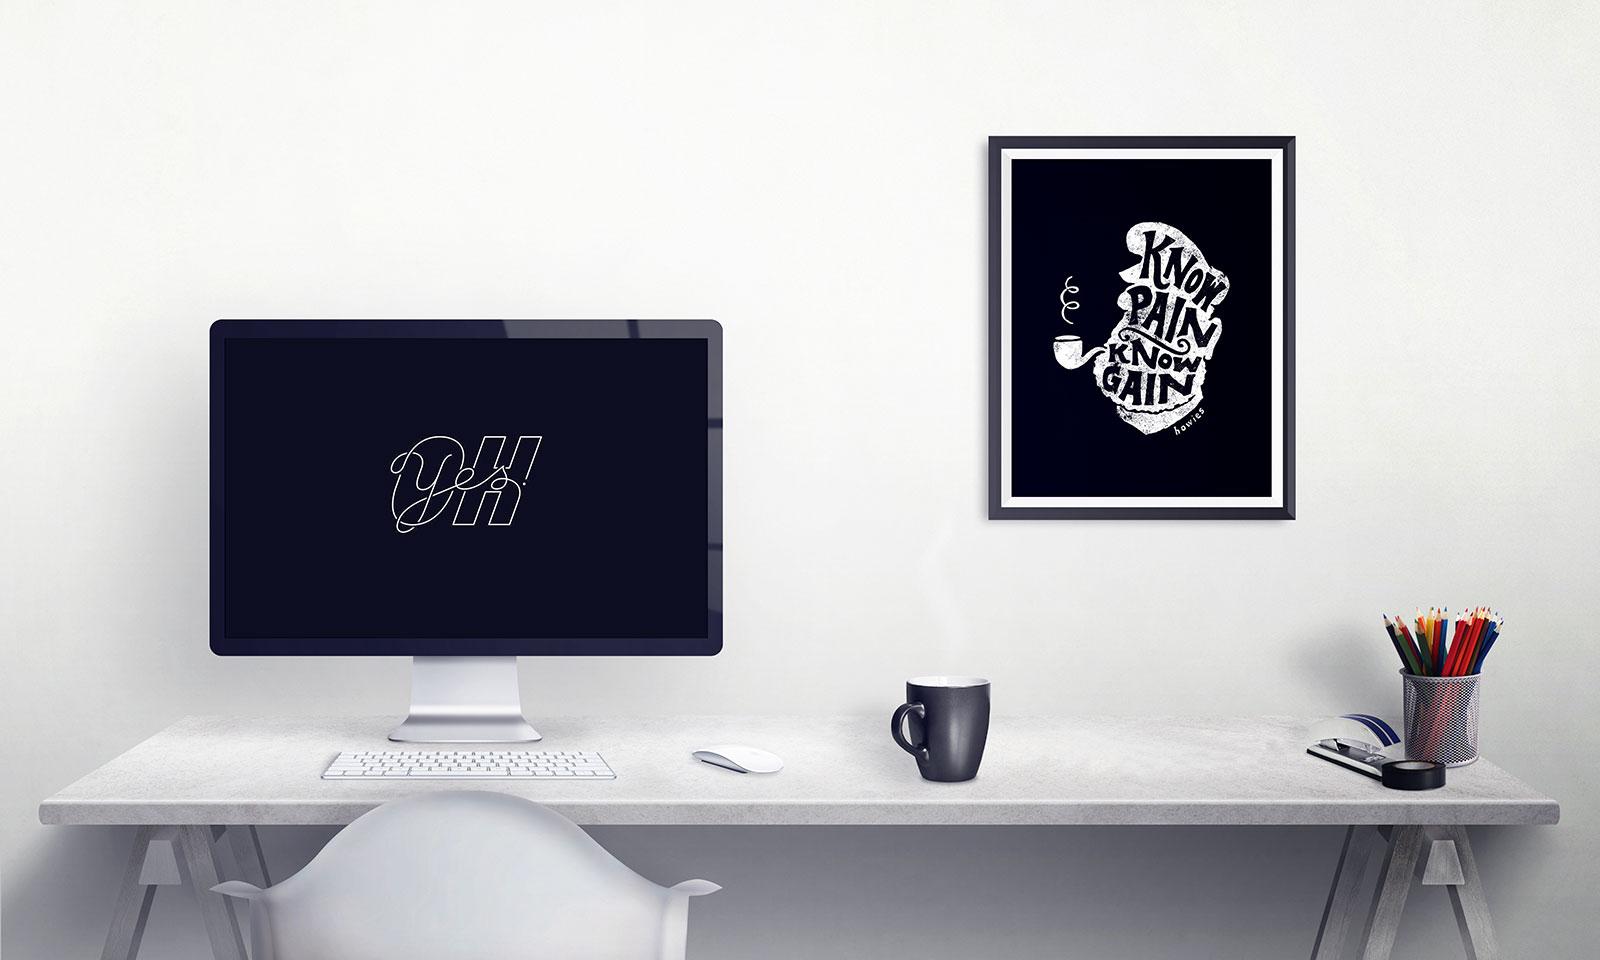 Free-iMac-&-Photo-Frame-Mockup-PSD